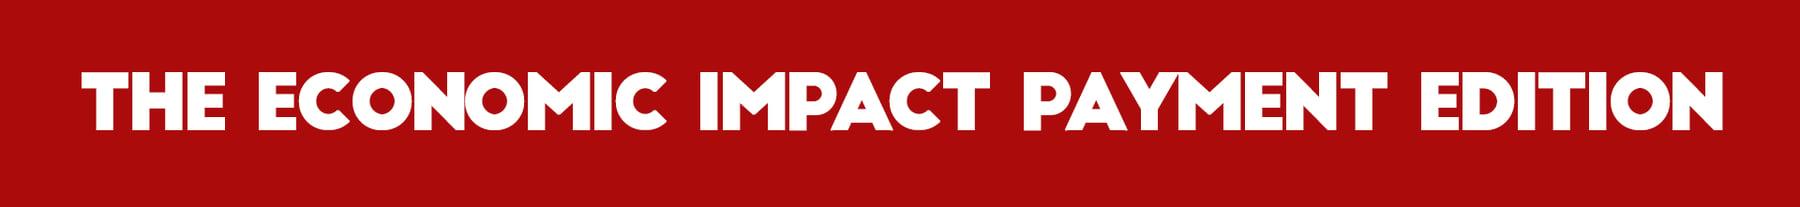 Economic Impact Payment COVID19 Stimulus Check Website Depot Newsletter